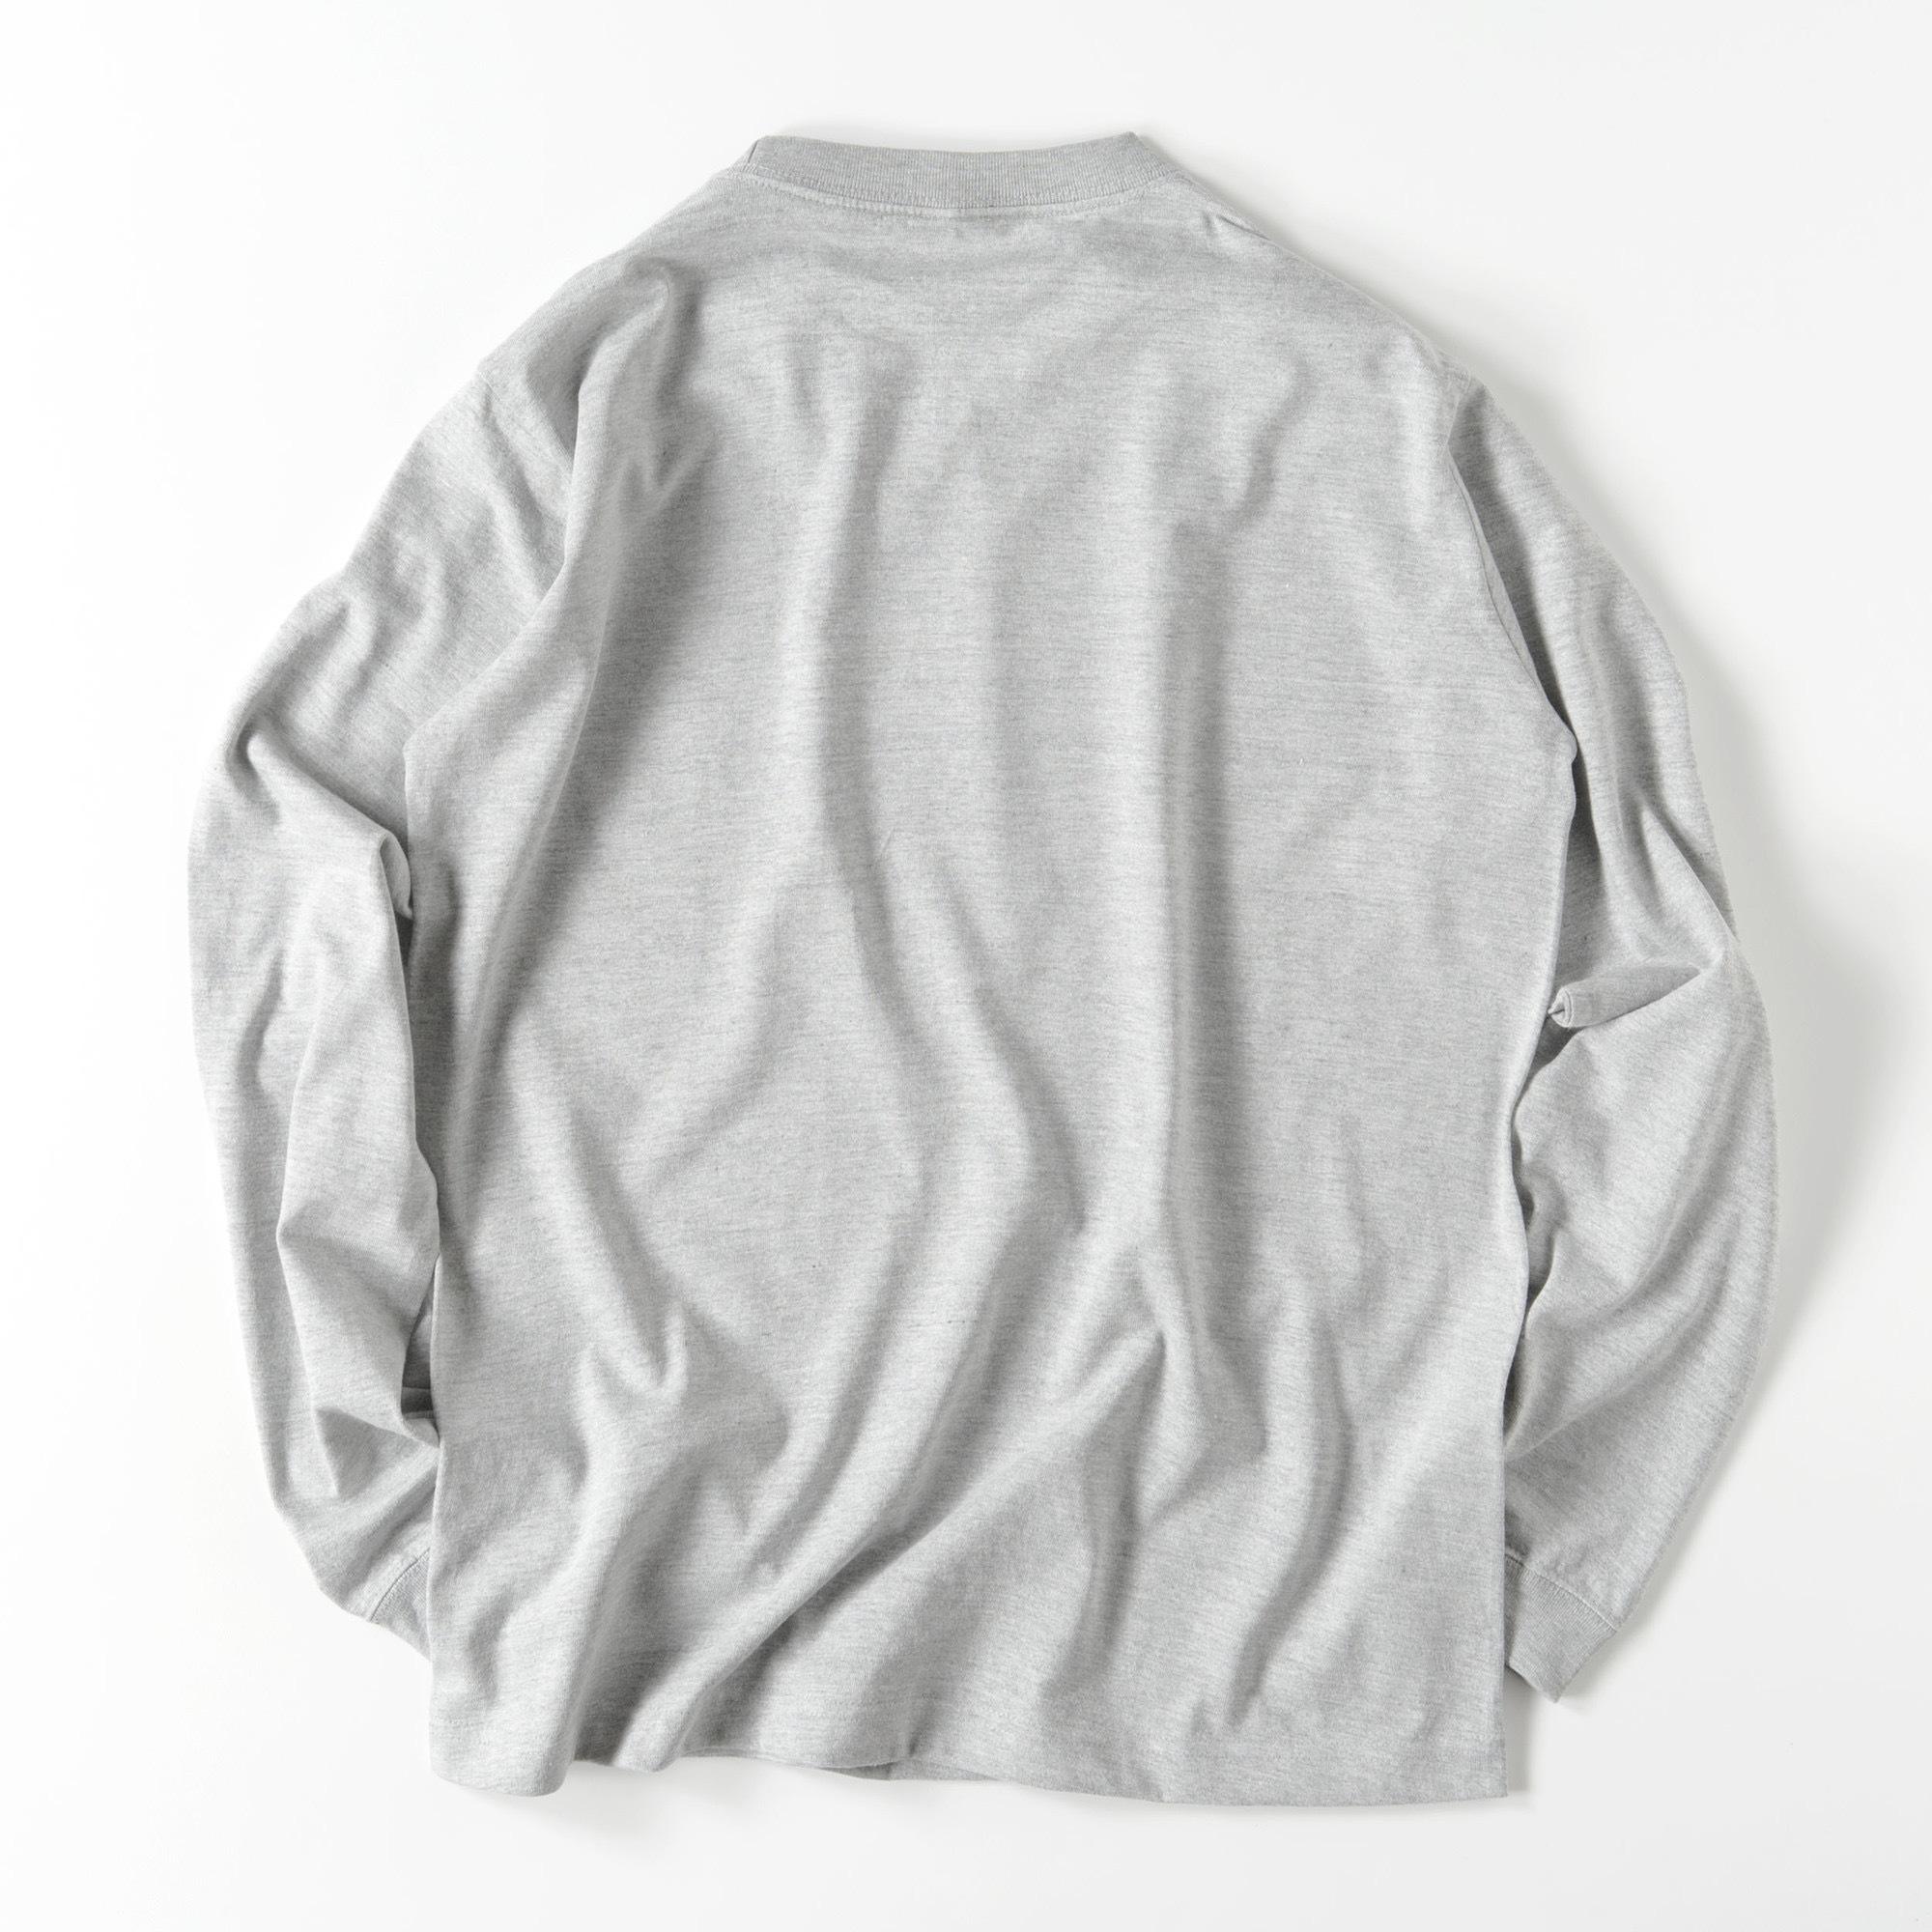 ahahahana_I/GRY/モノトーン【シンプルデザインTシャツ】©mayu_color.888